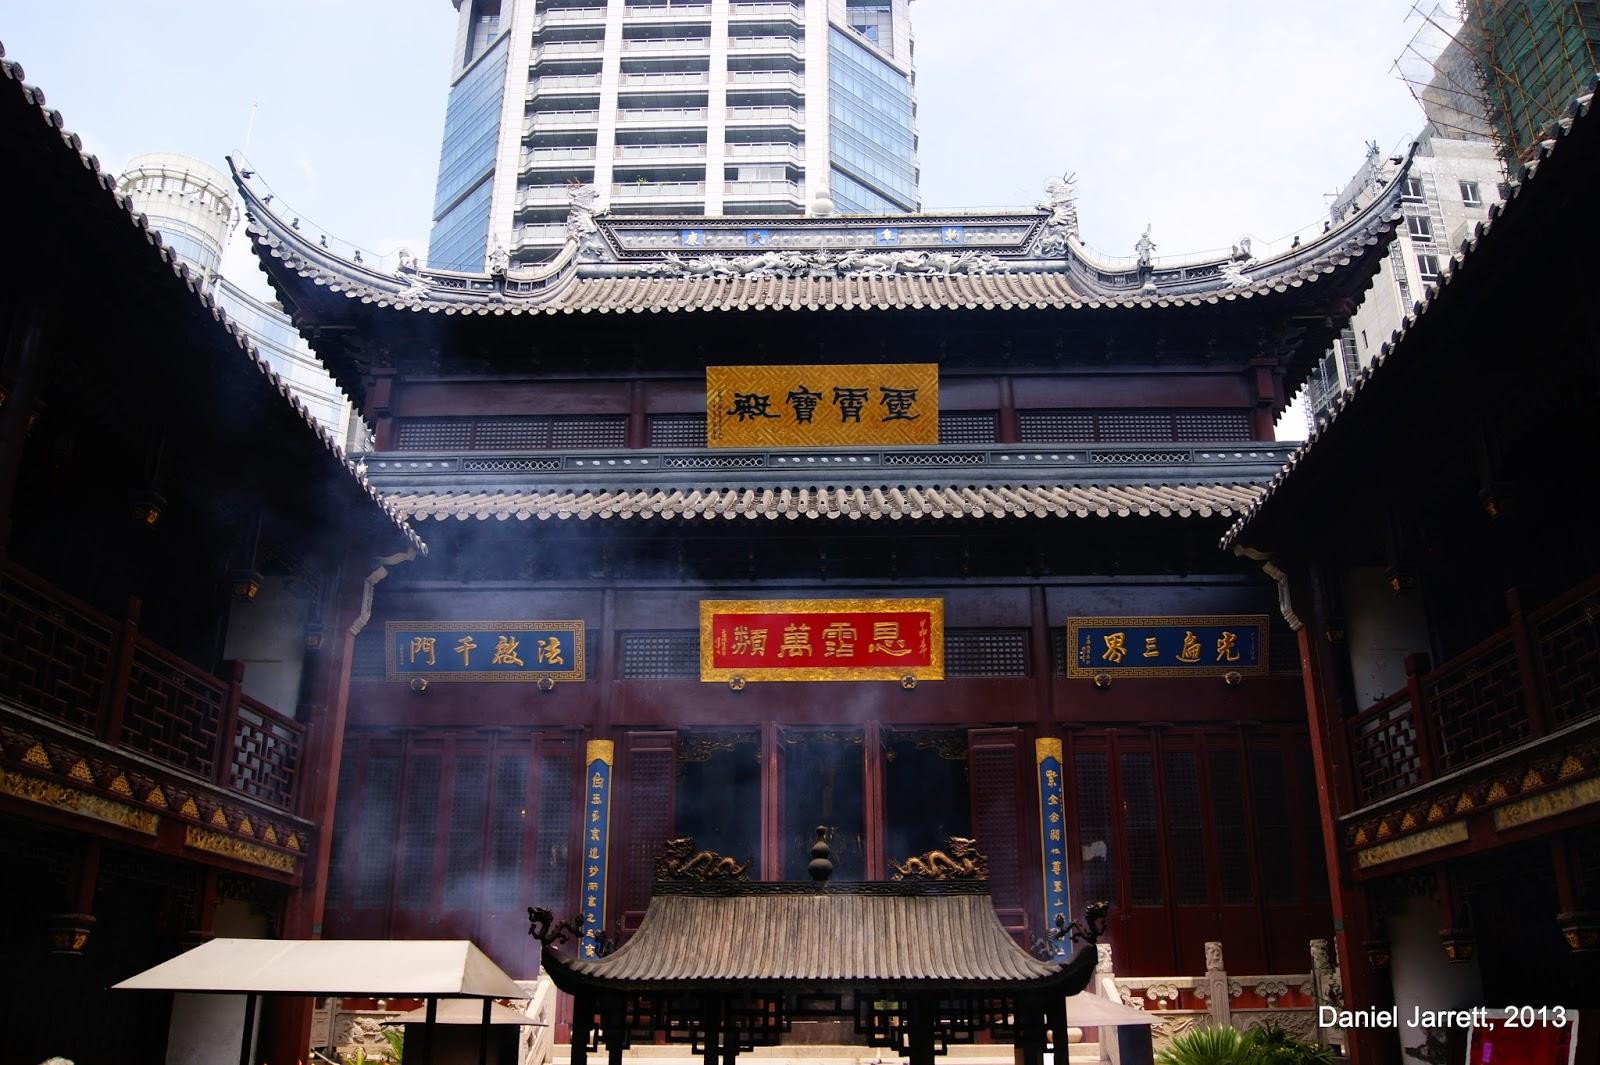 Baiyun Temple